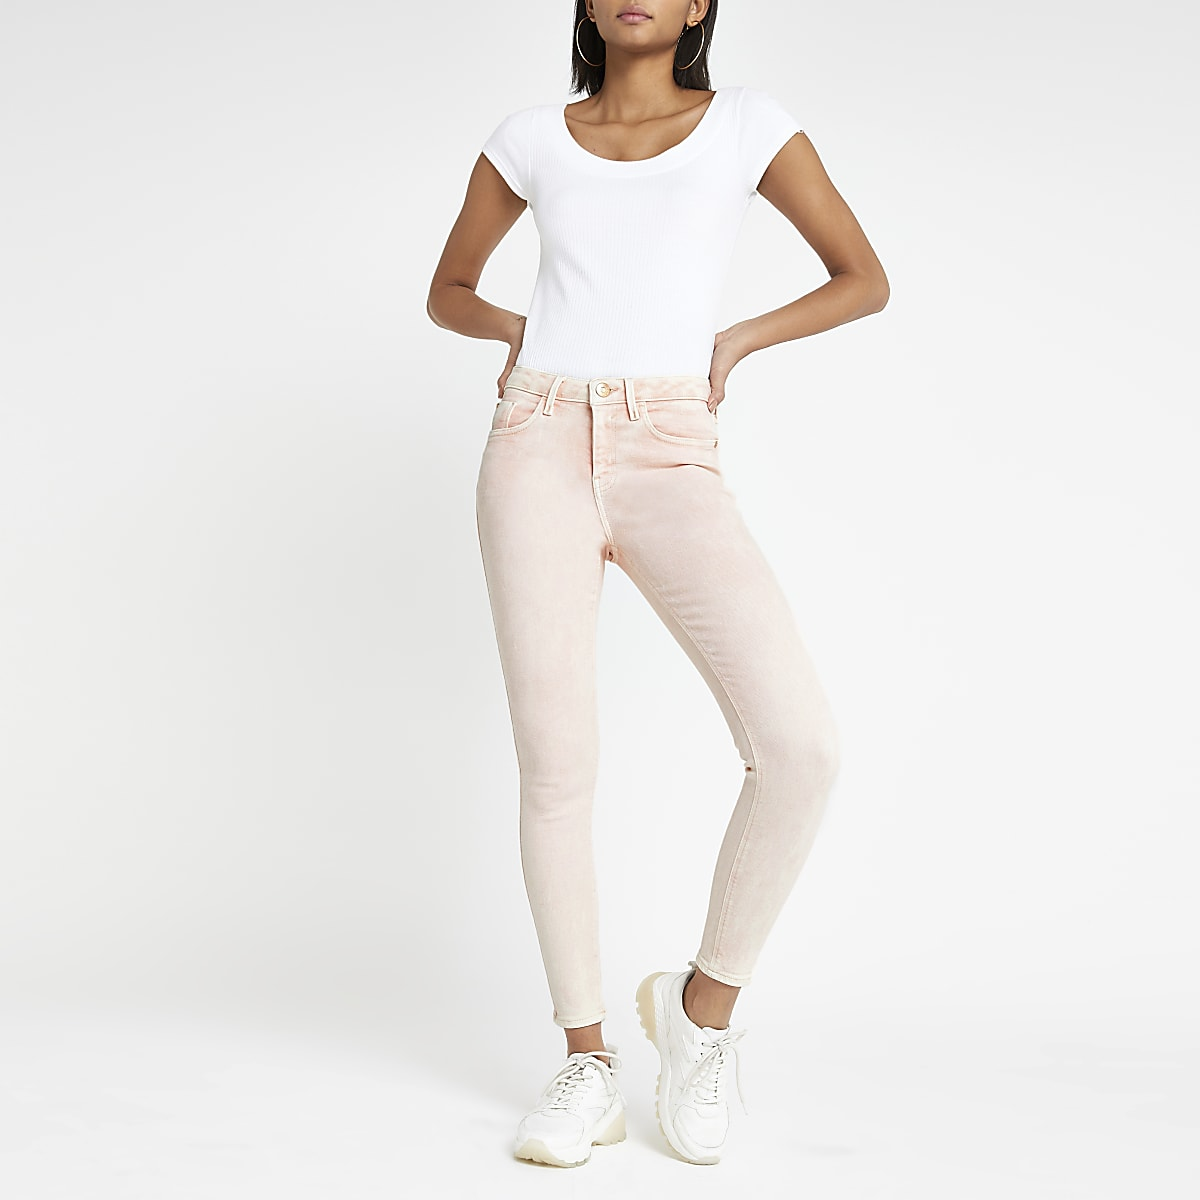 Amelie - Roze superskinny jeans